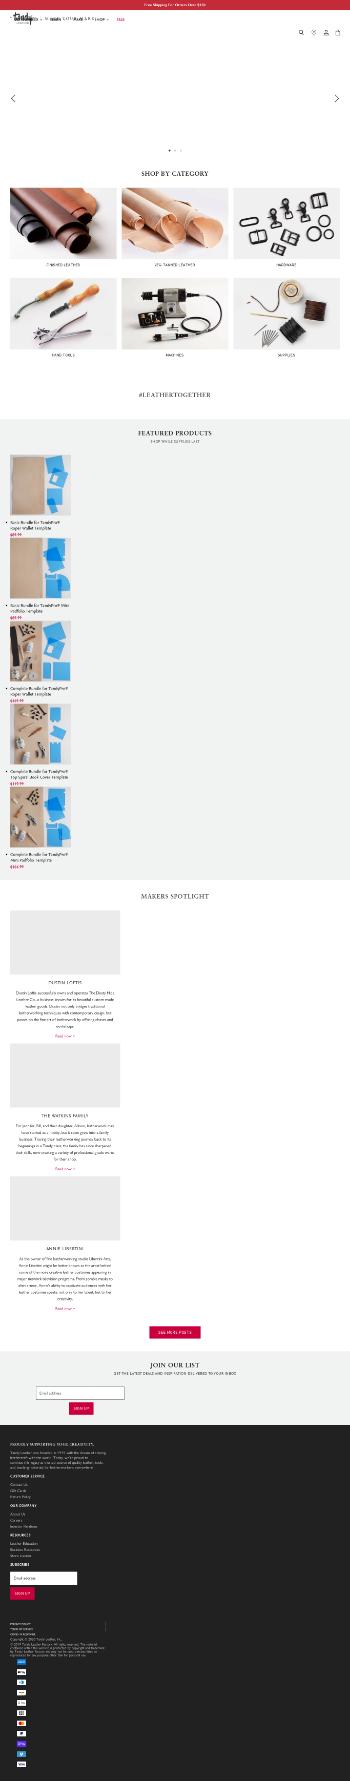 Tandy Leather Factory, Inc. Website Screenshot